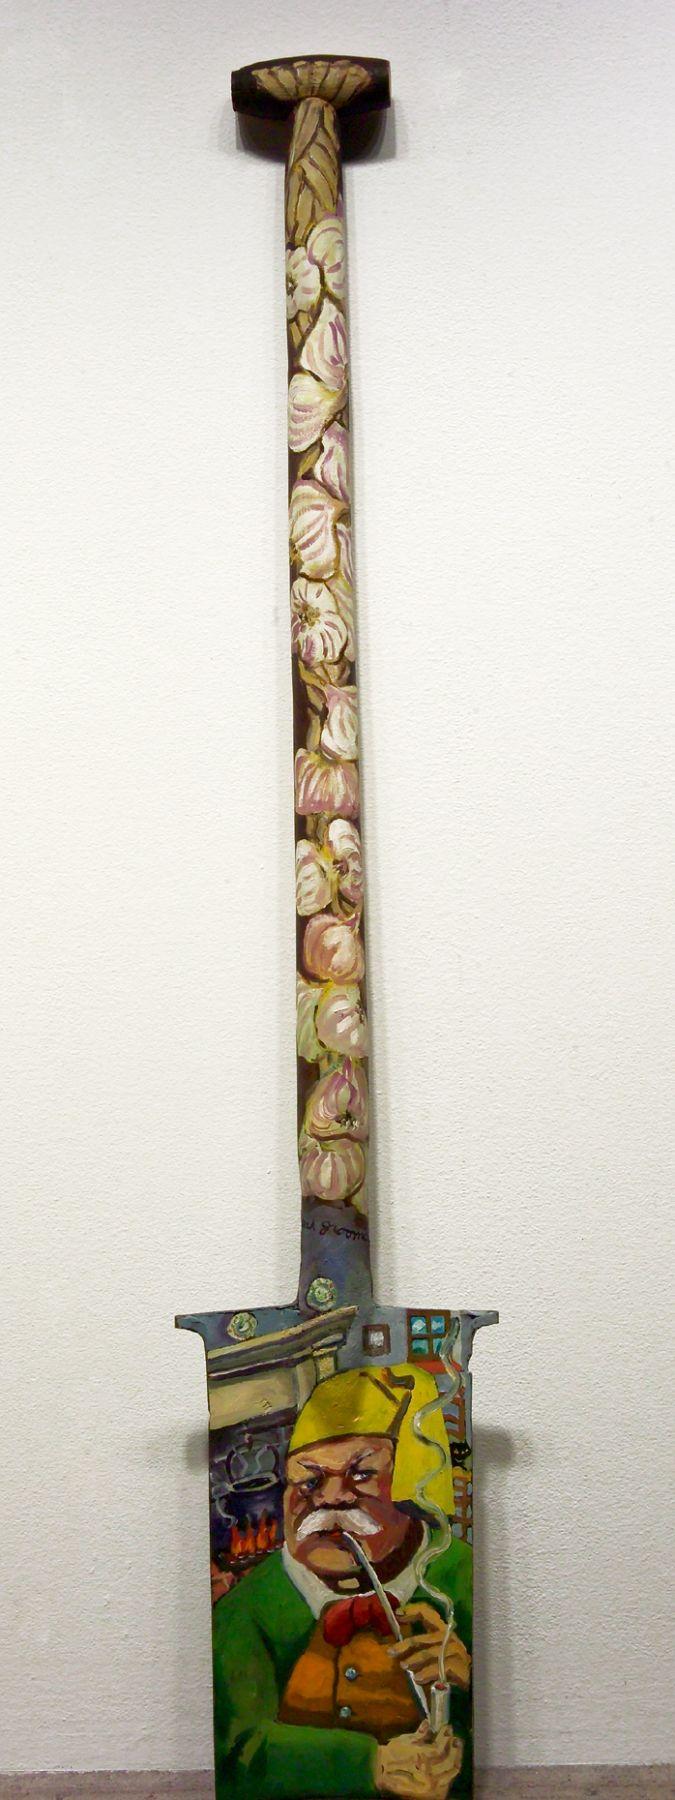 Red Grooms, L'Arlesian, n.d., oil on wood/metal, 48 x 8 x 2 inches